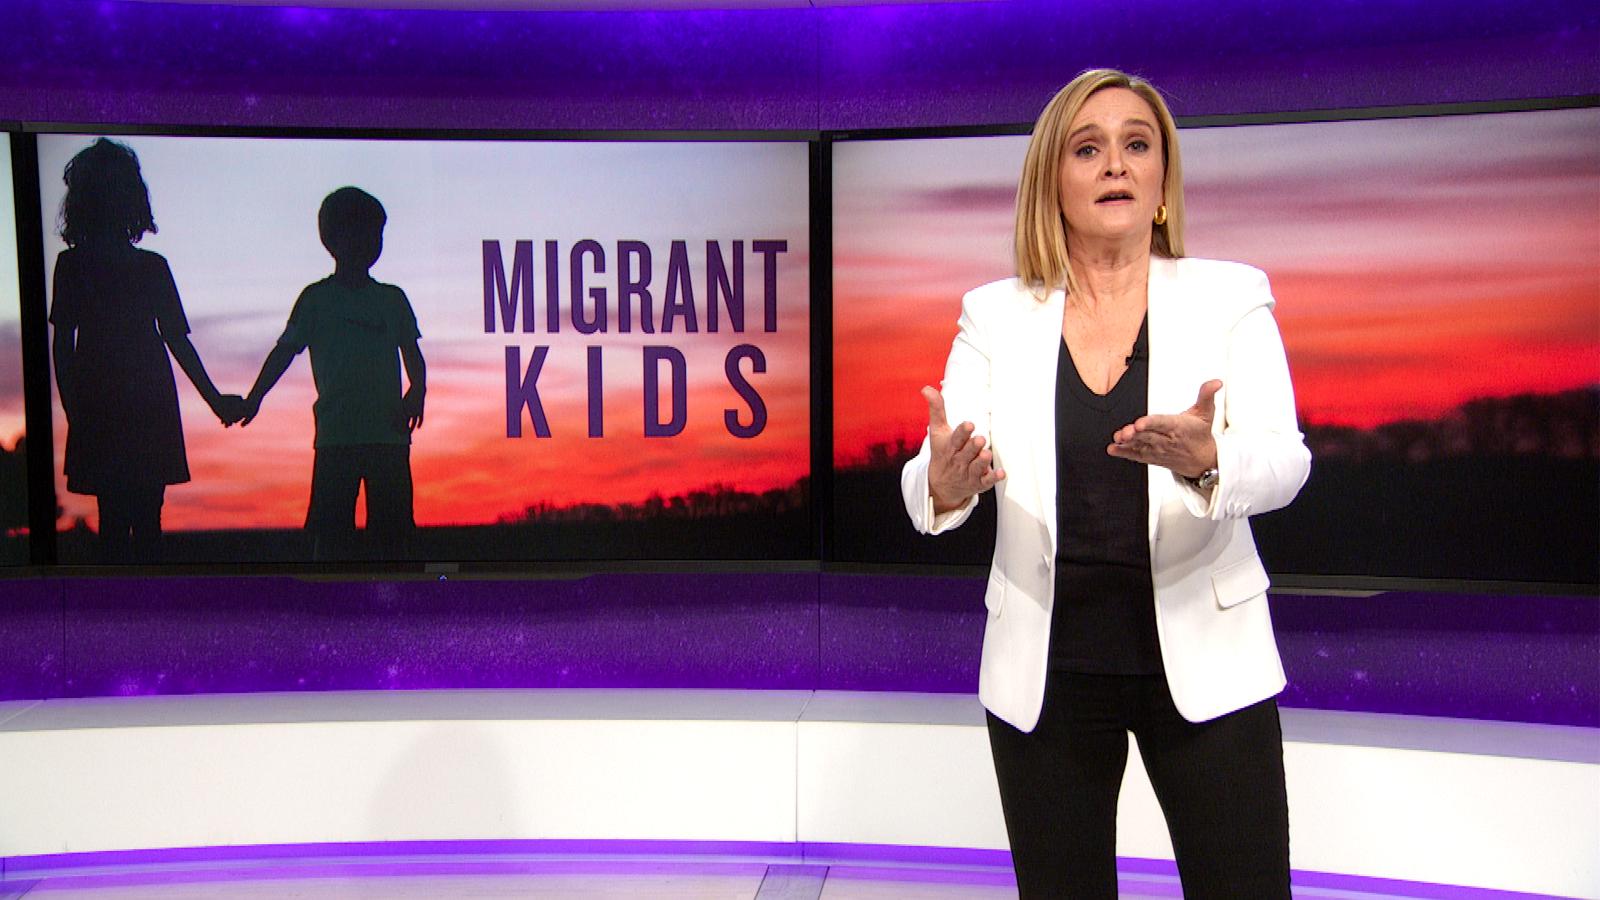 Missing Migrant Children Update | TBS.com